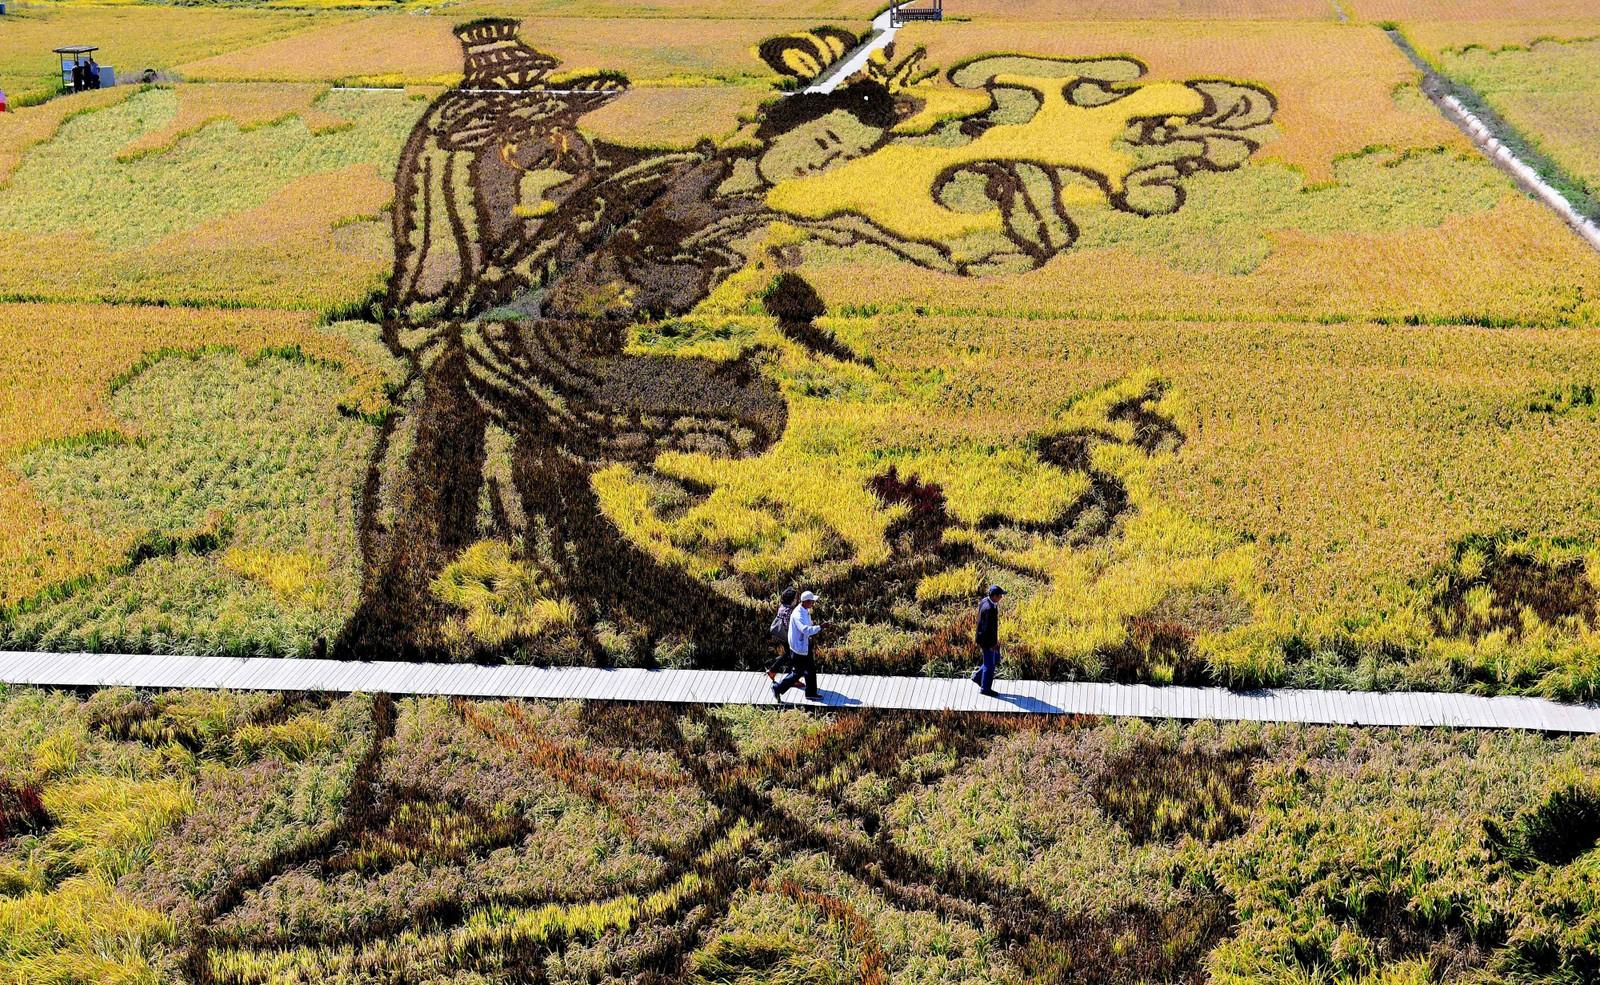 Lokale risbønder i Shenyang, Kina, håper disse kunstverkene skal føre til økt omsetning og turisme.